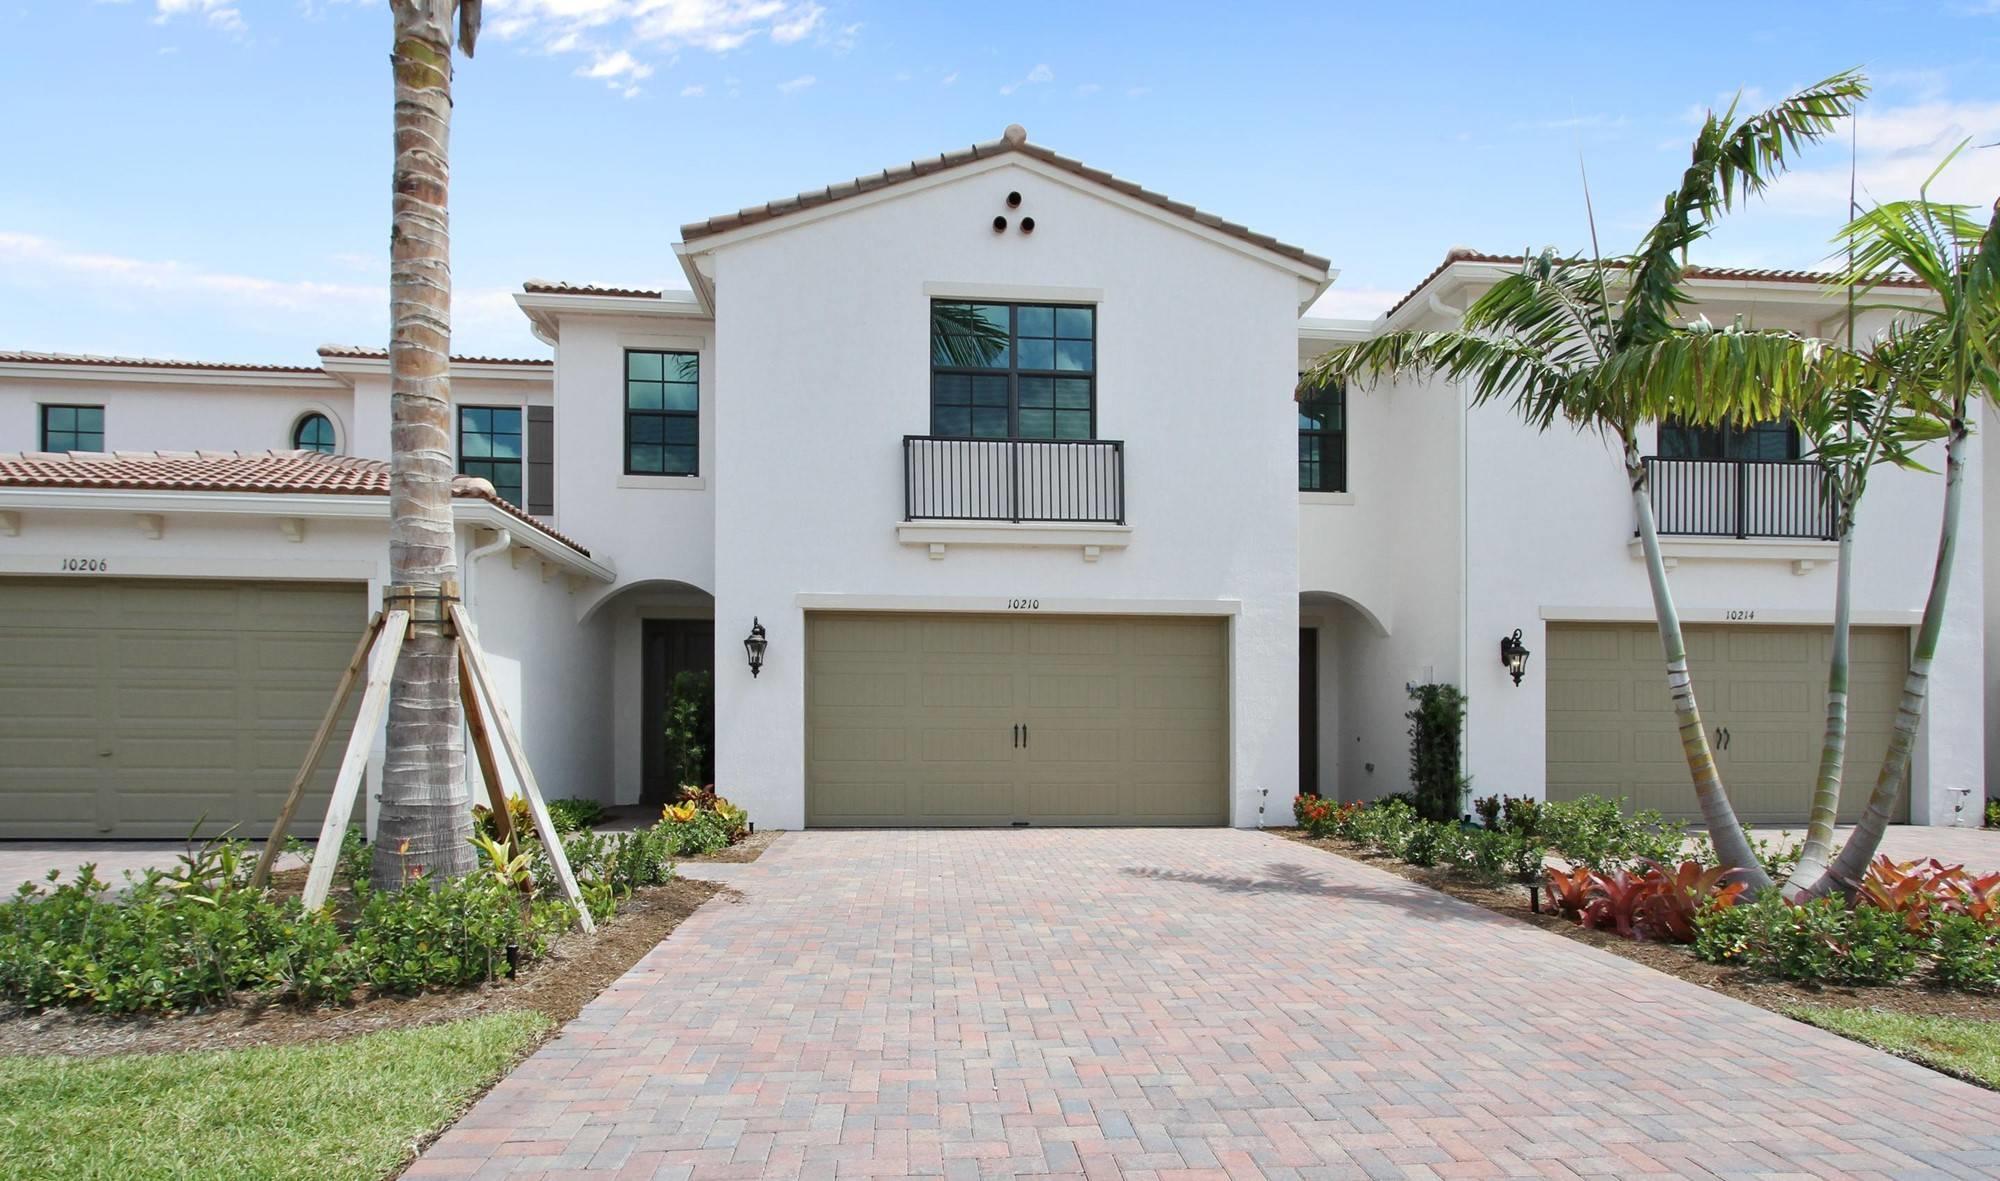 10065  Brickhill Drive 133 For Sale 10633964, FL